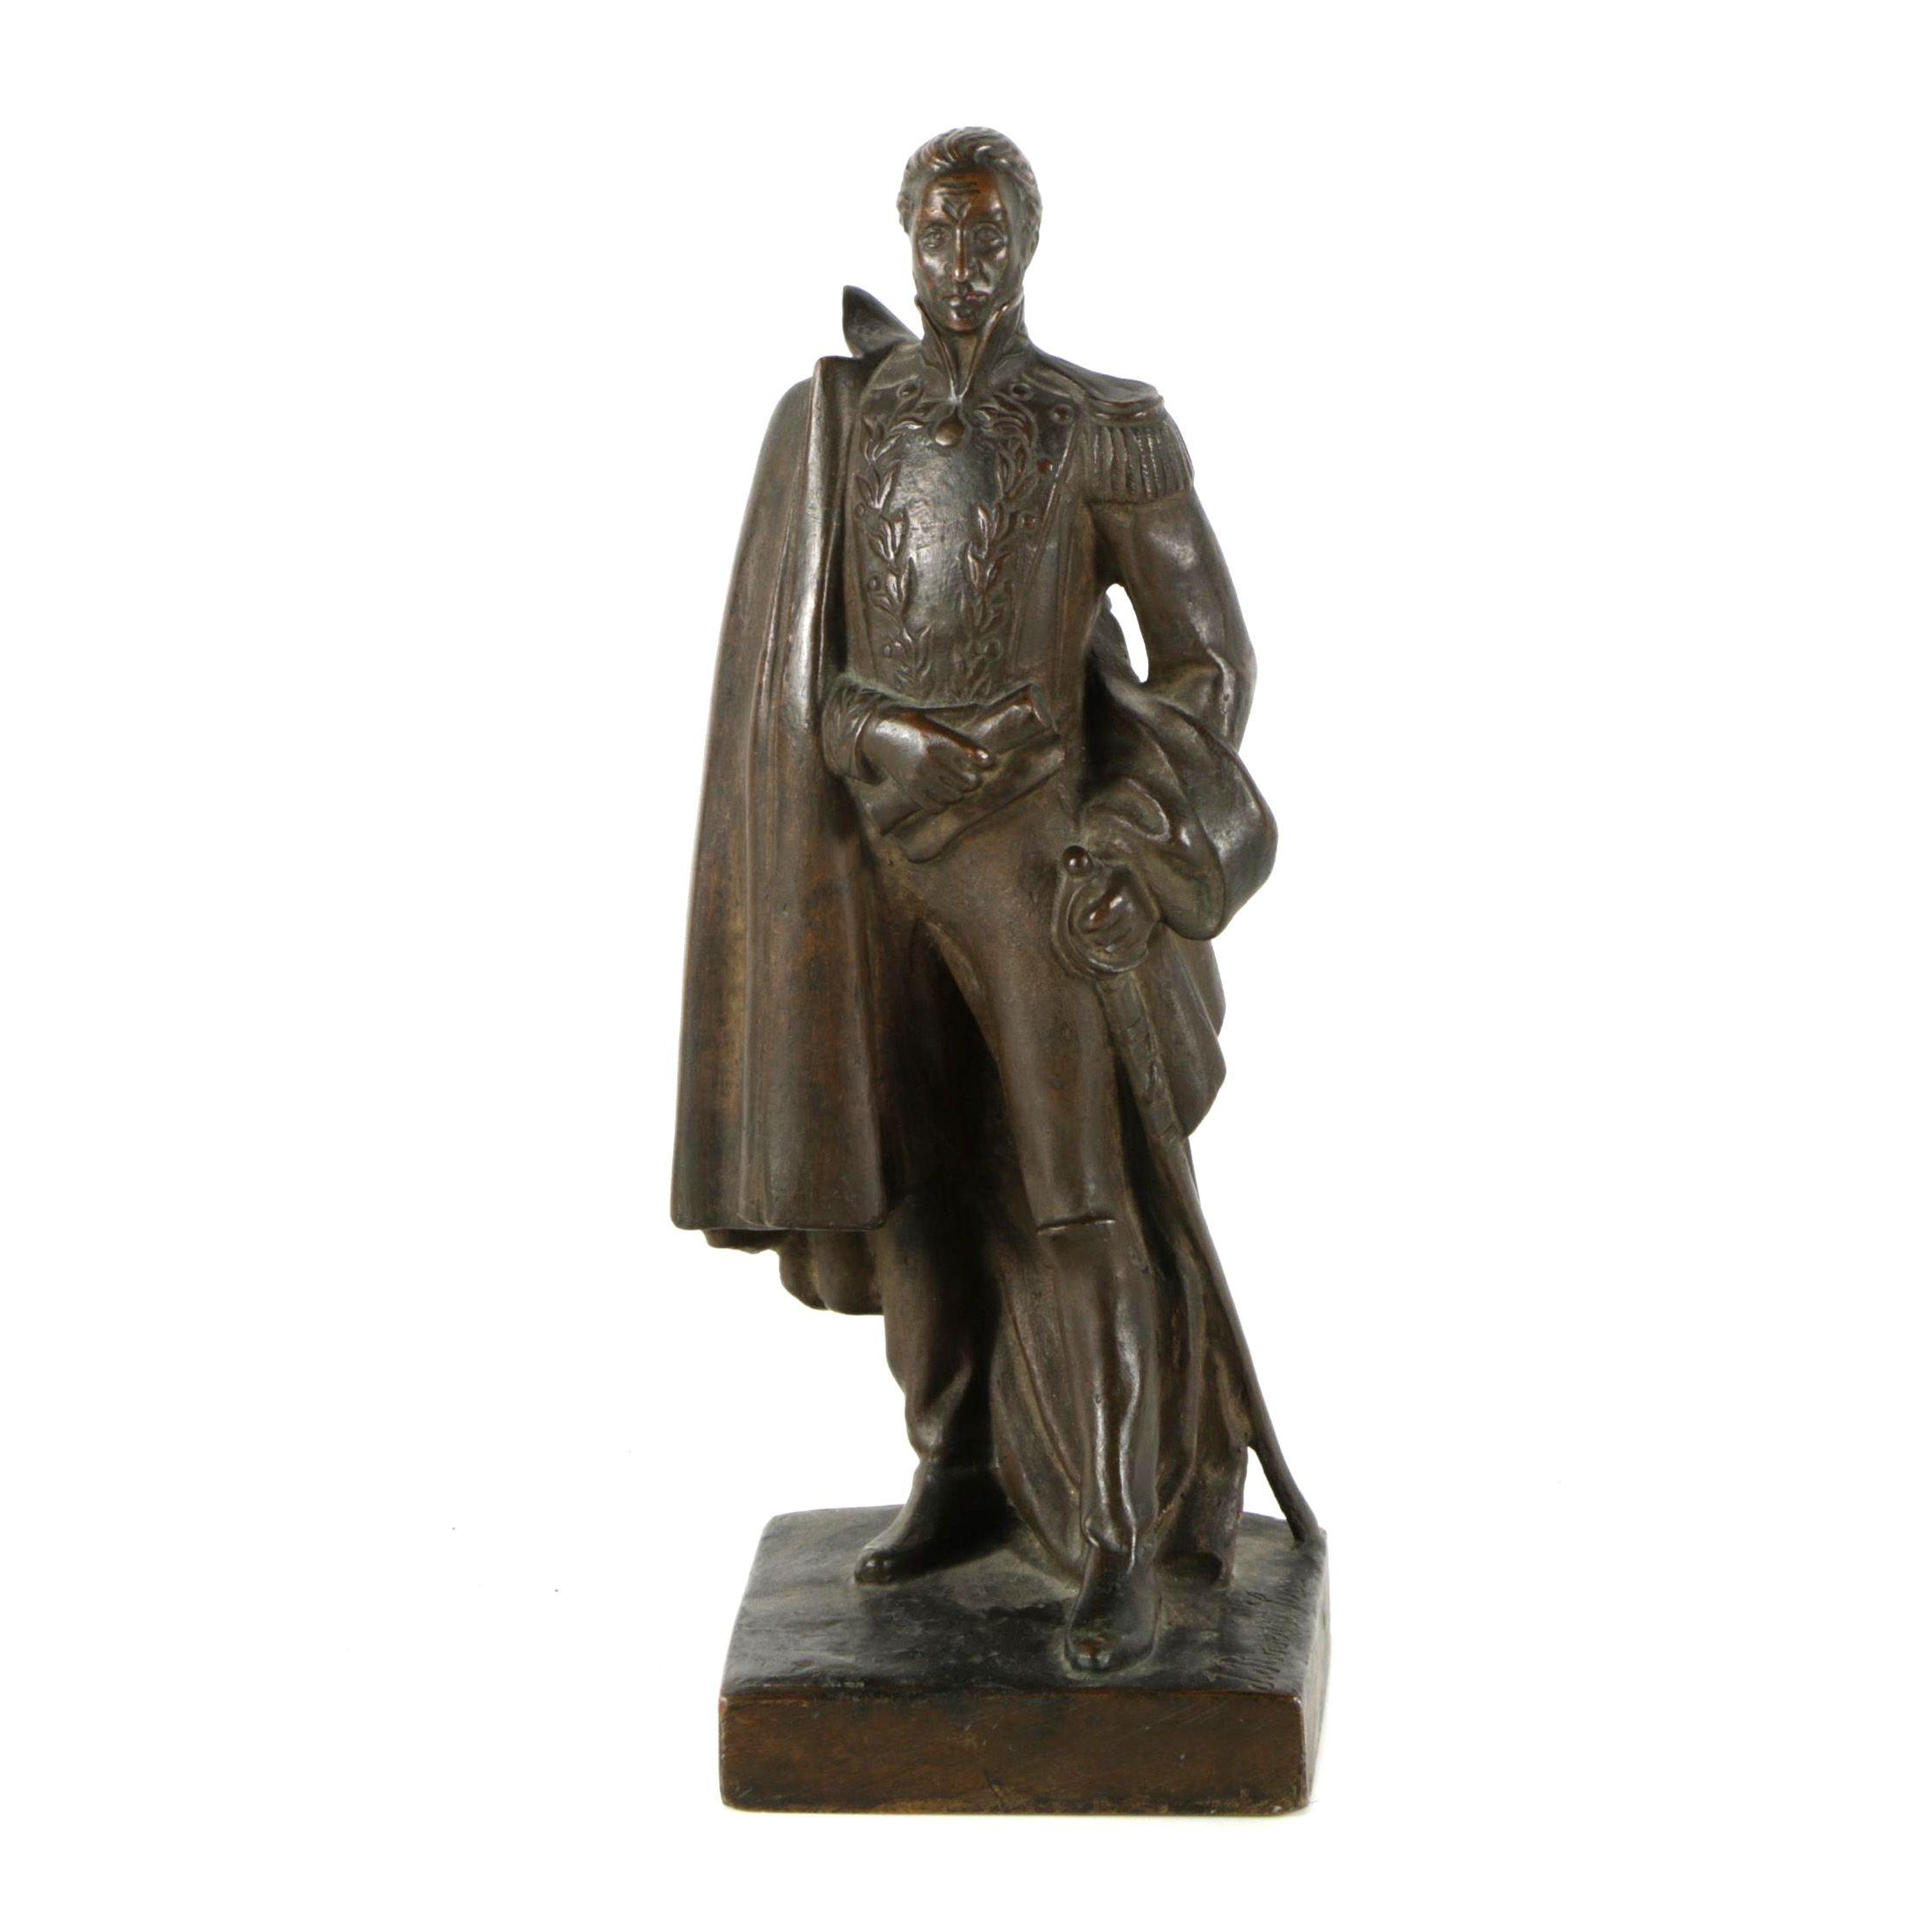 Bronze Sculpture of 18th Century Military Figure